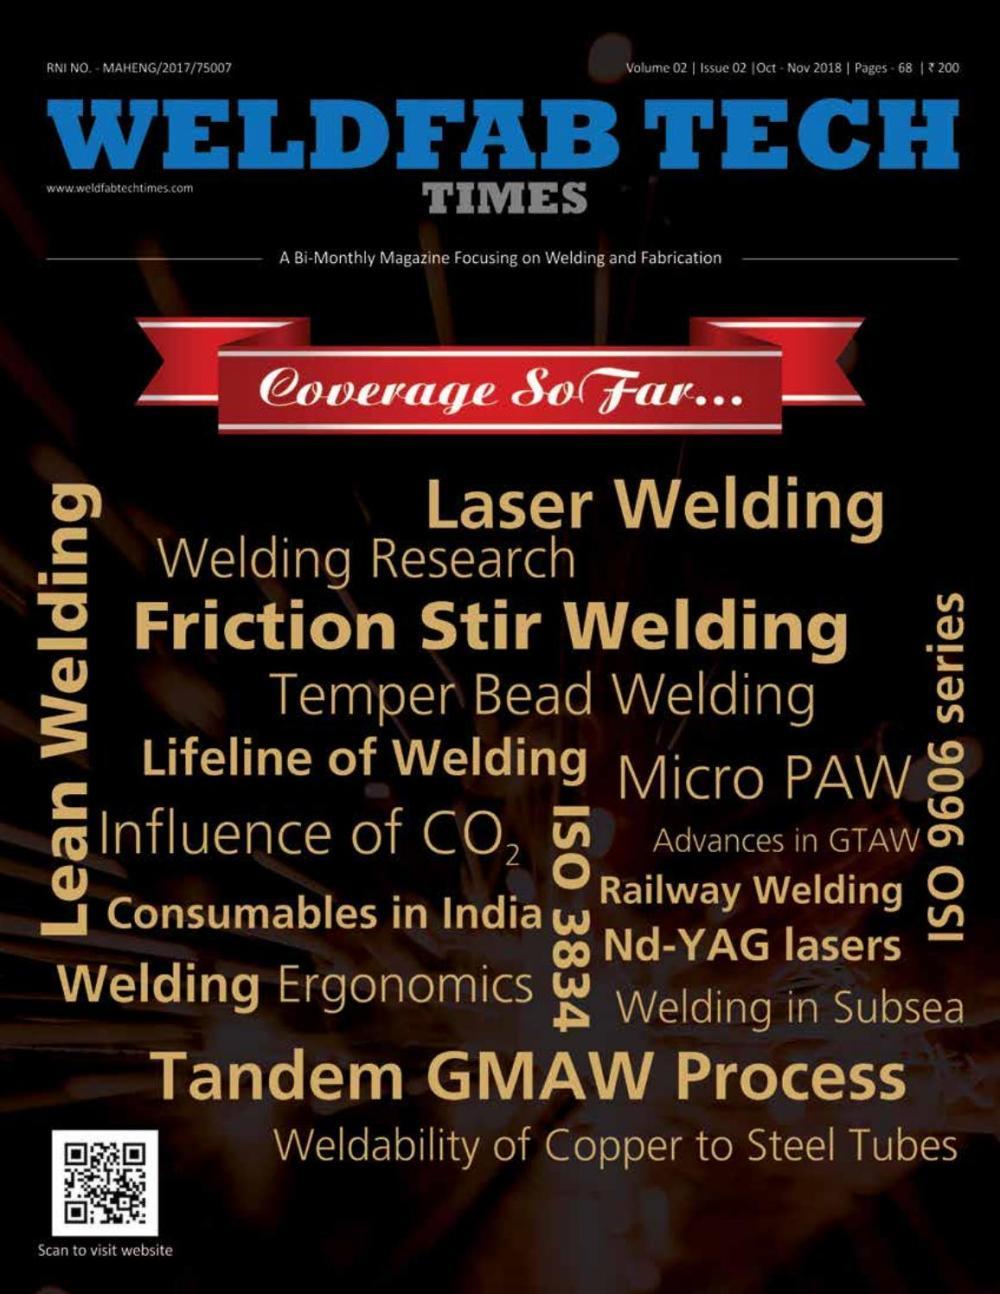 medium resolution of weldfab tech times oct nov 2018